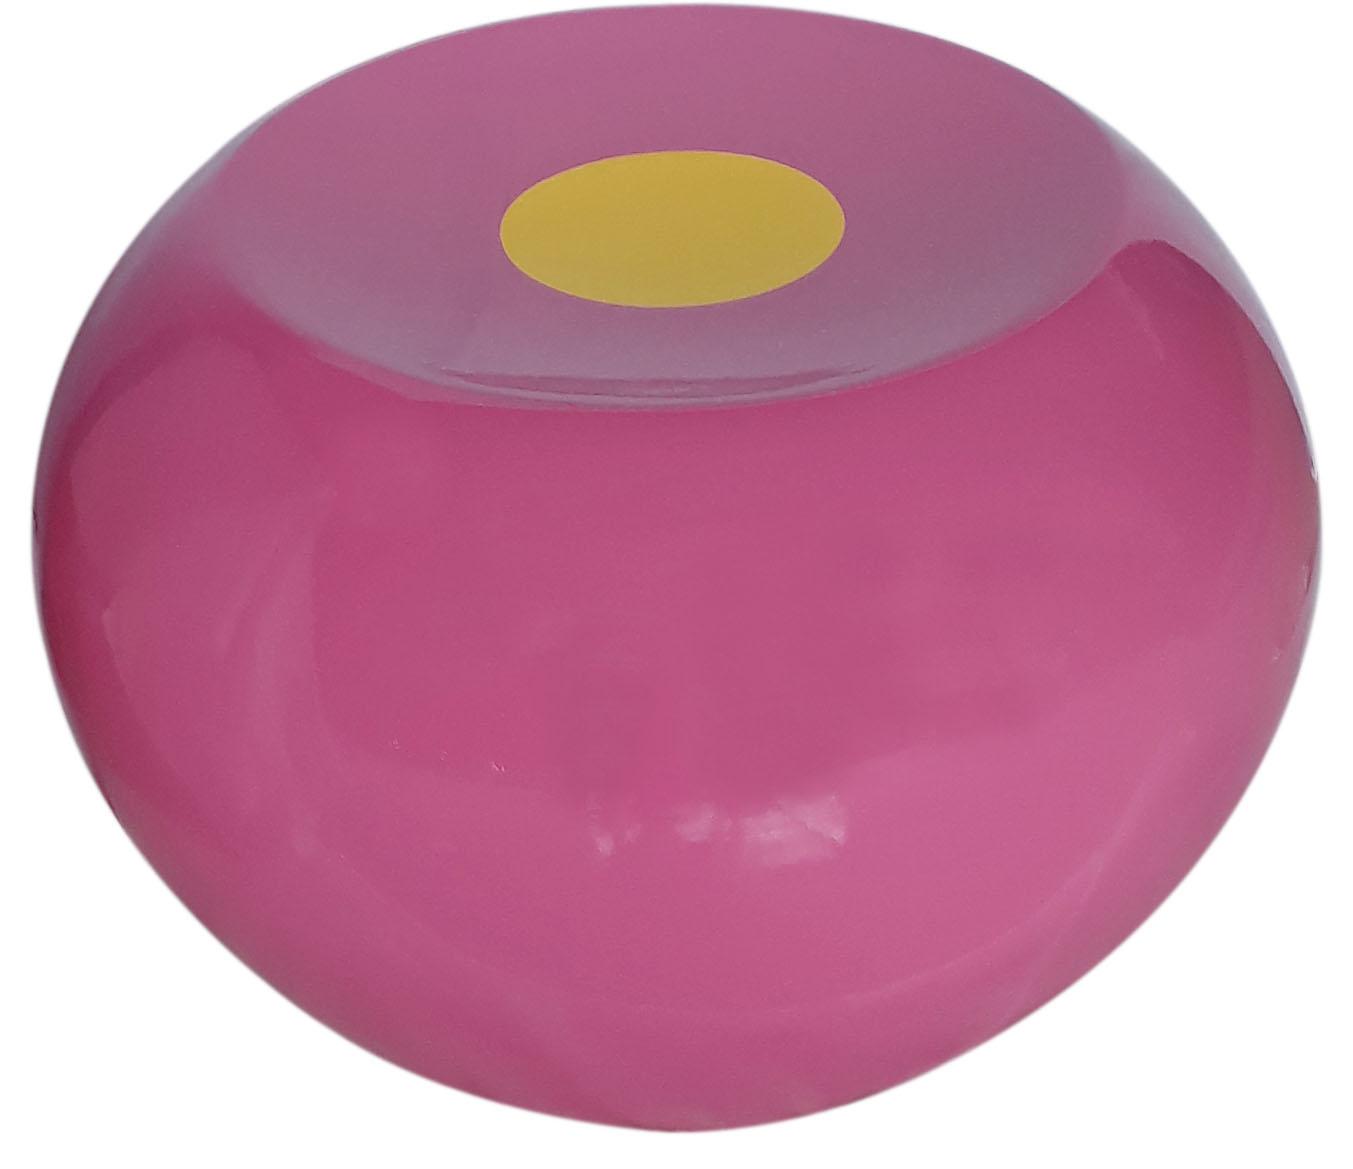 Stool-Pink & yellow.jpg